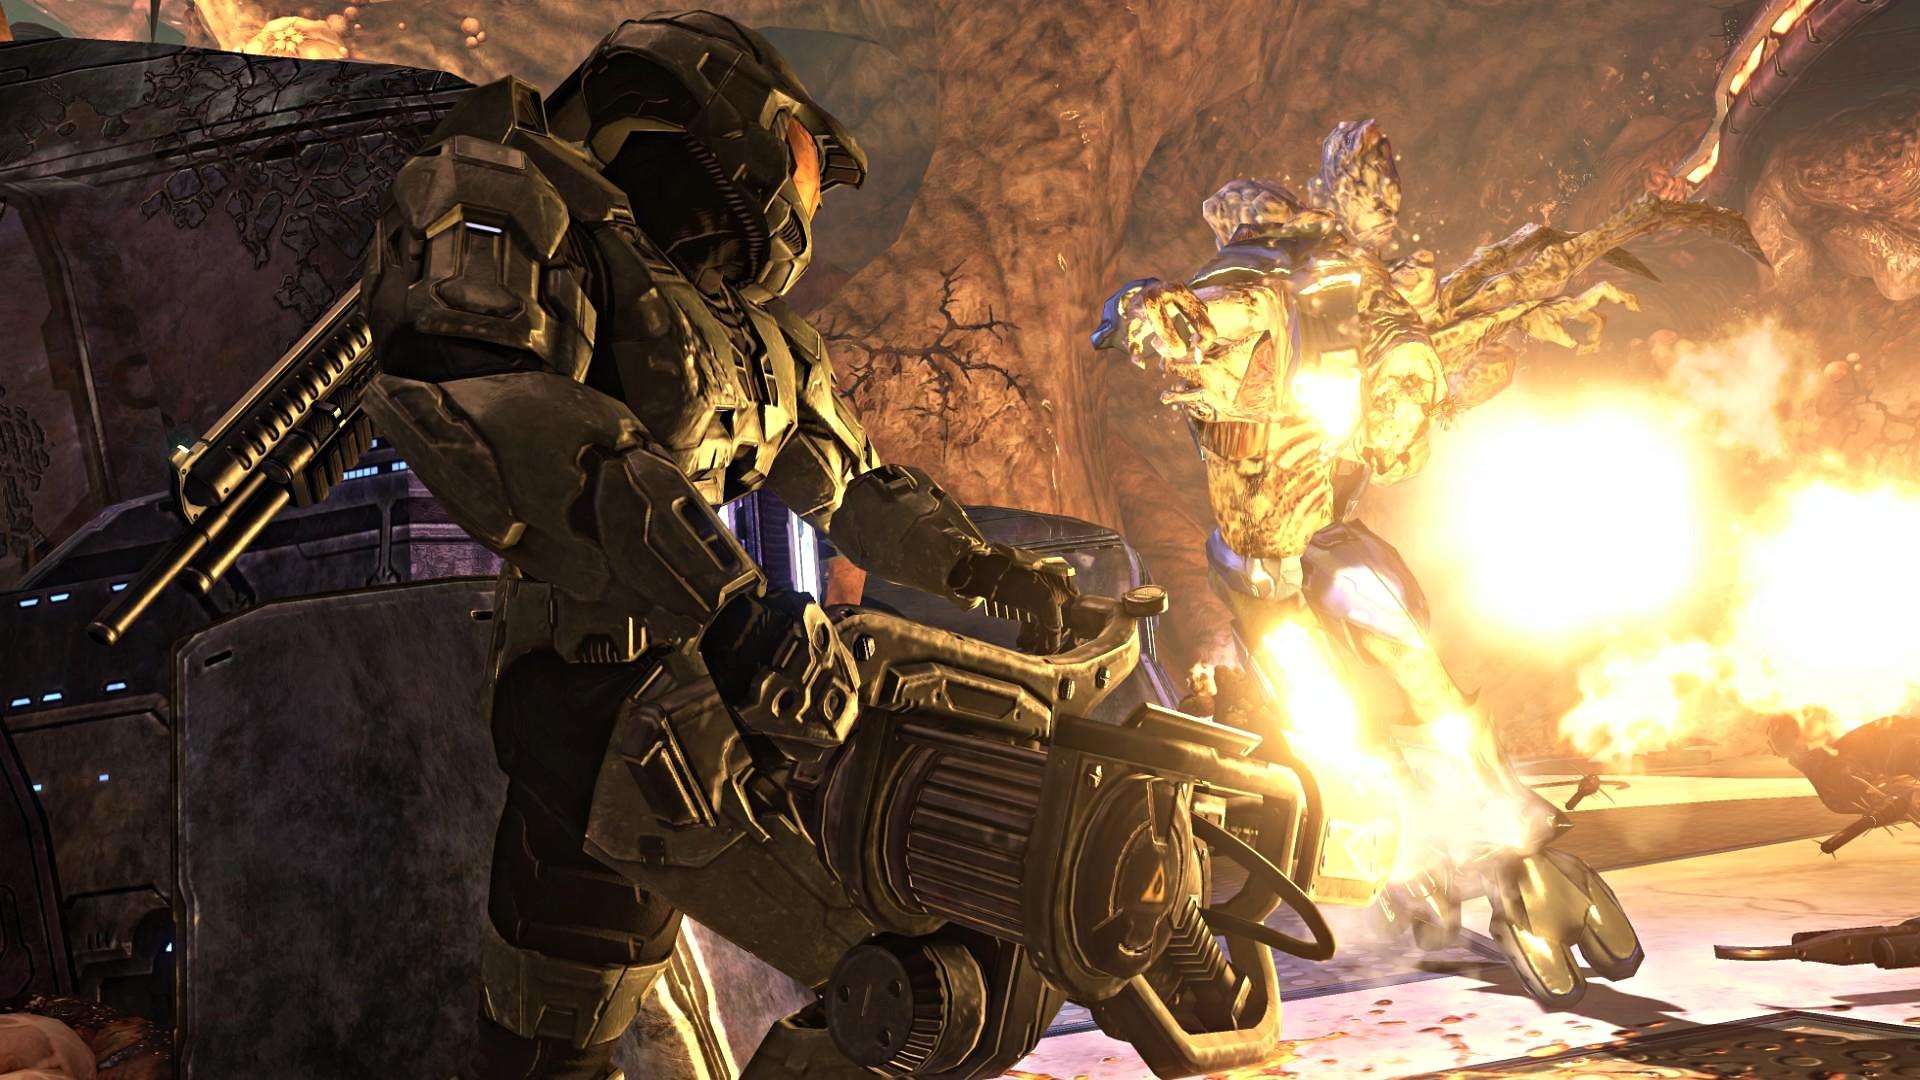 Image – Halo-3-Wallpaper-CORTANA-chapter-1080p-16-MASTER-CHIEF-FLAMETHROWER.jpg    Deadliest Fiction Wiki   FANDOM powered by Wikia